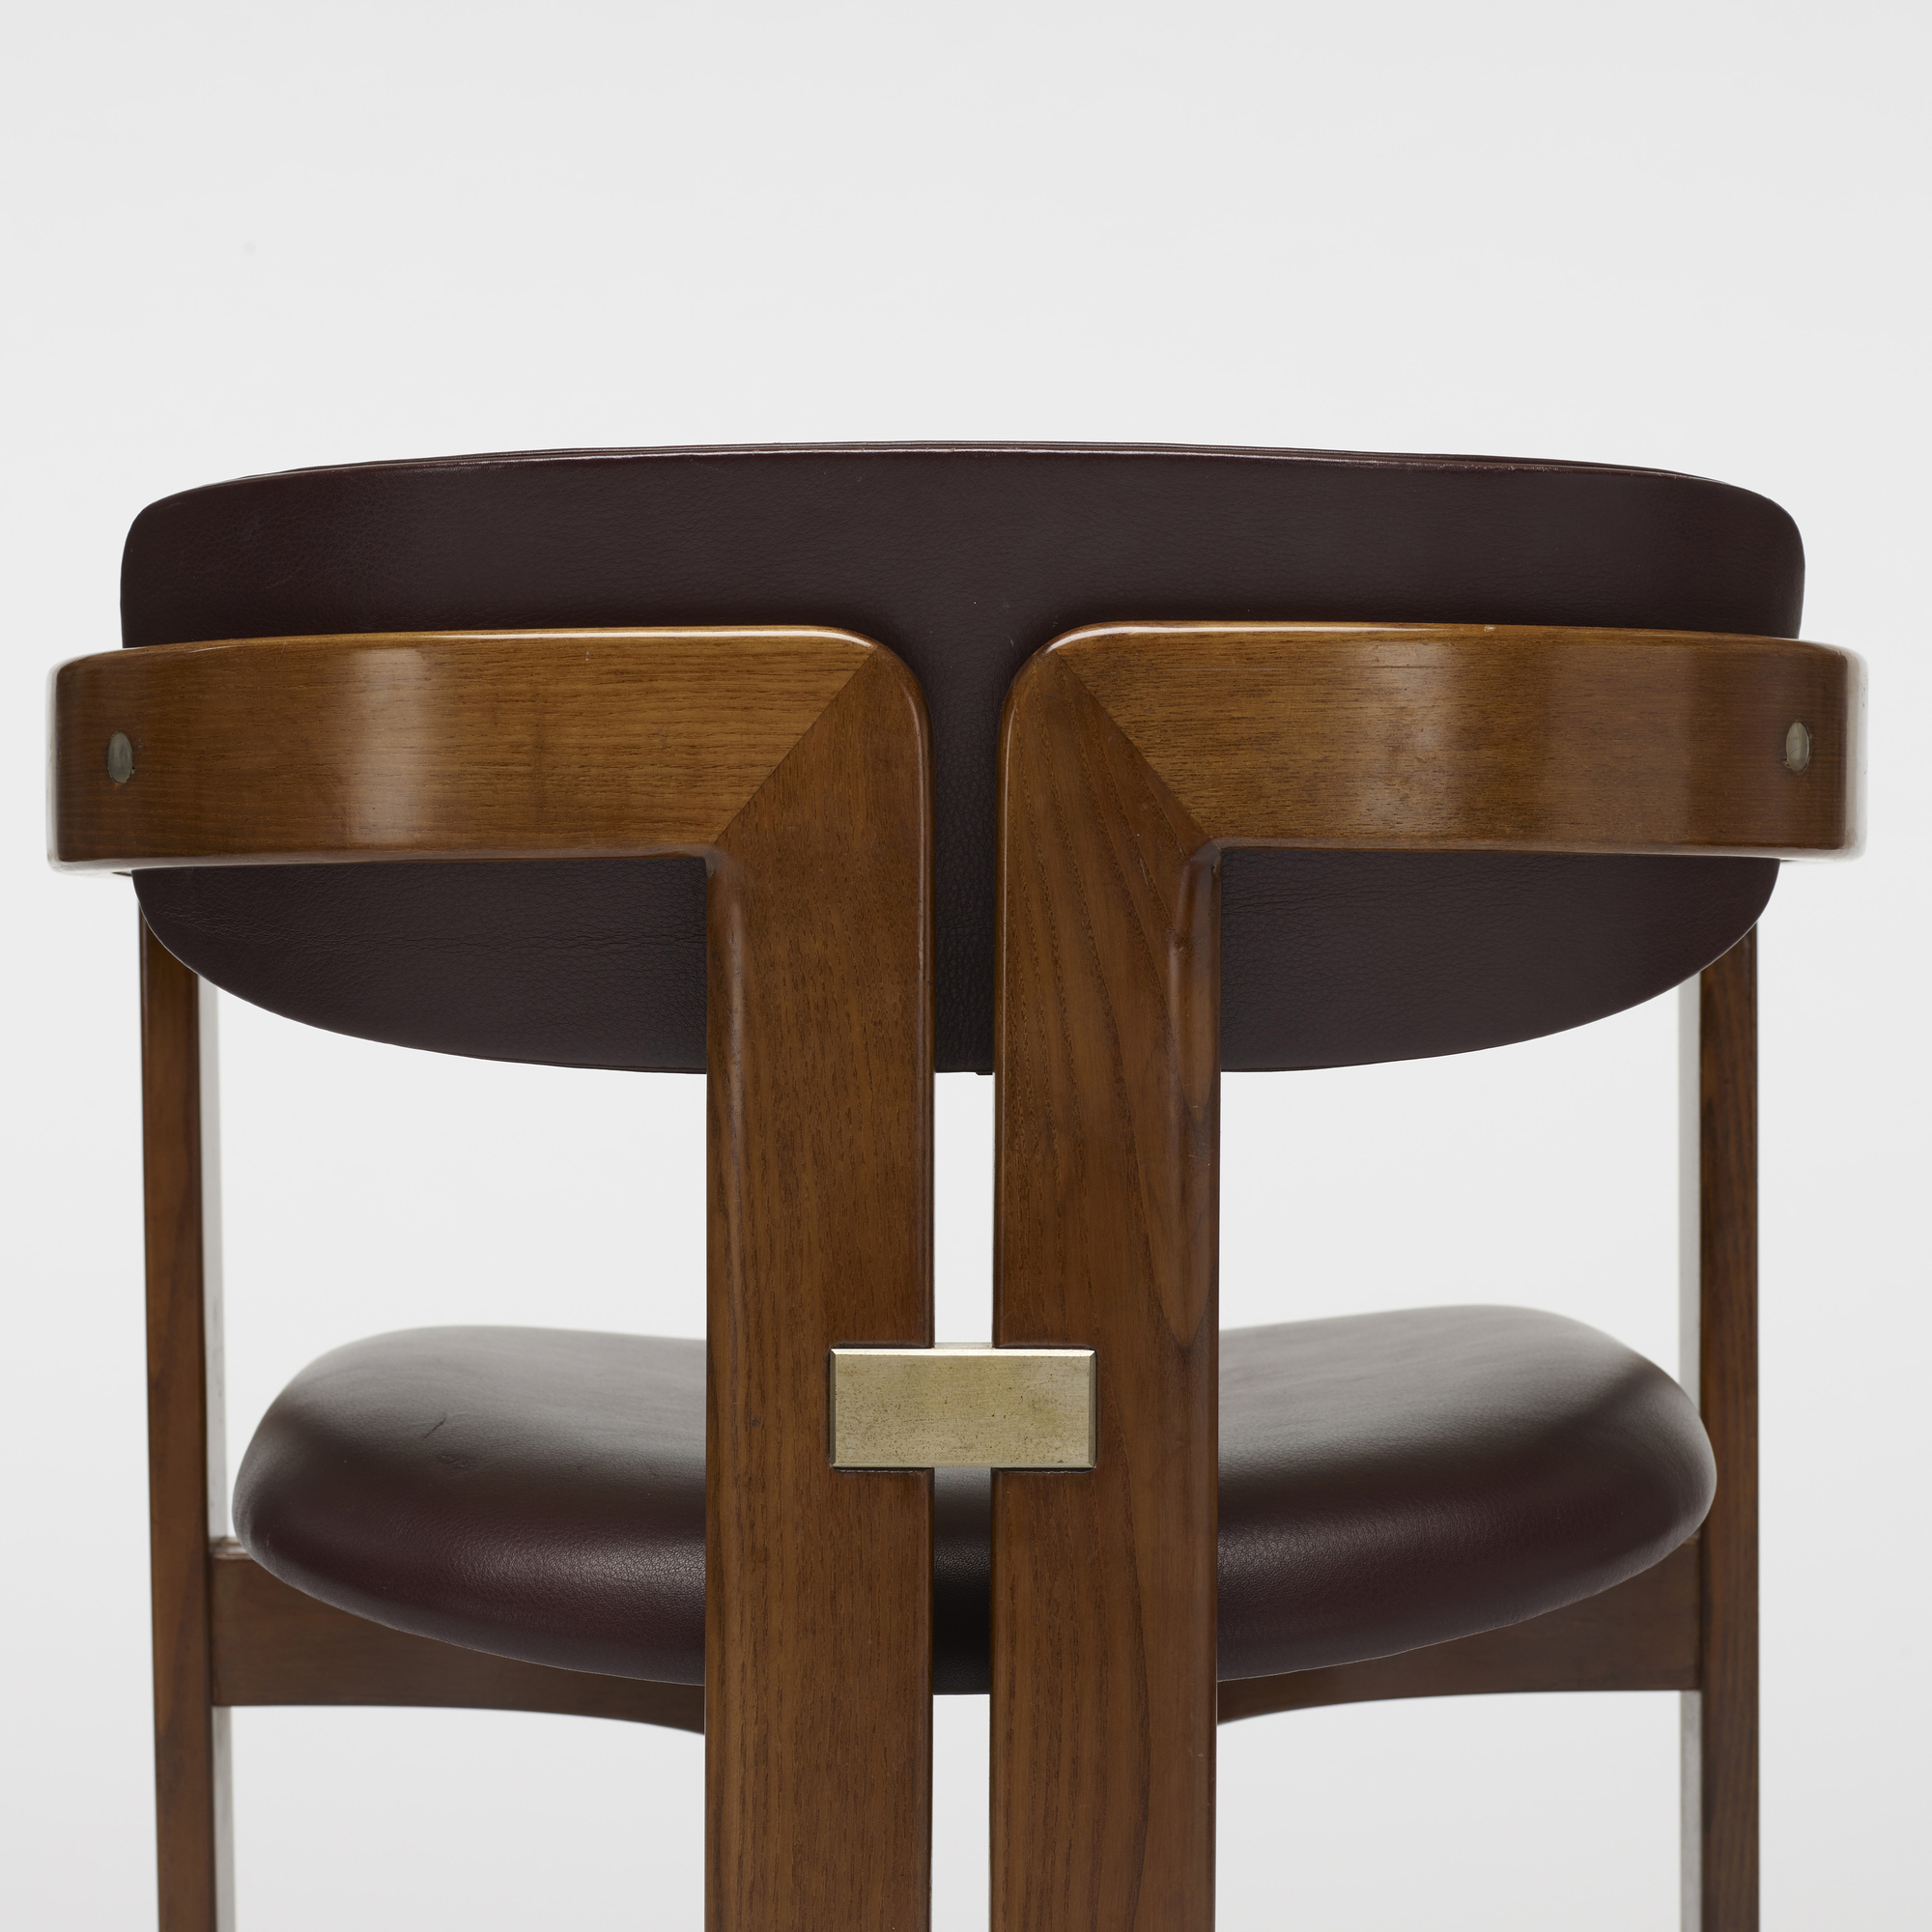 711: Augusto Savini / Pamplona dining chairs, pair (4 of 4)